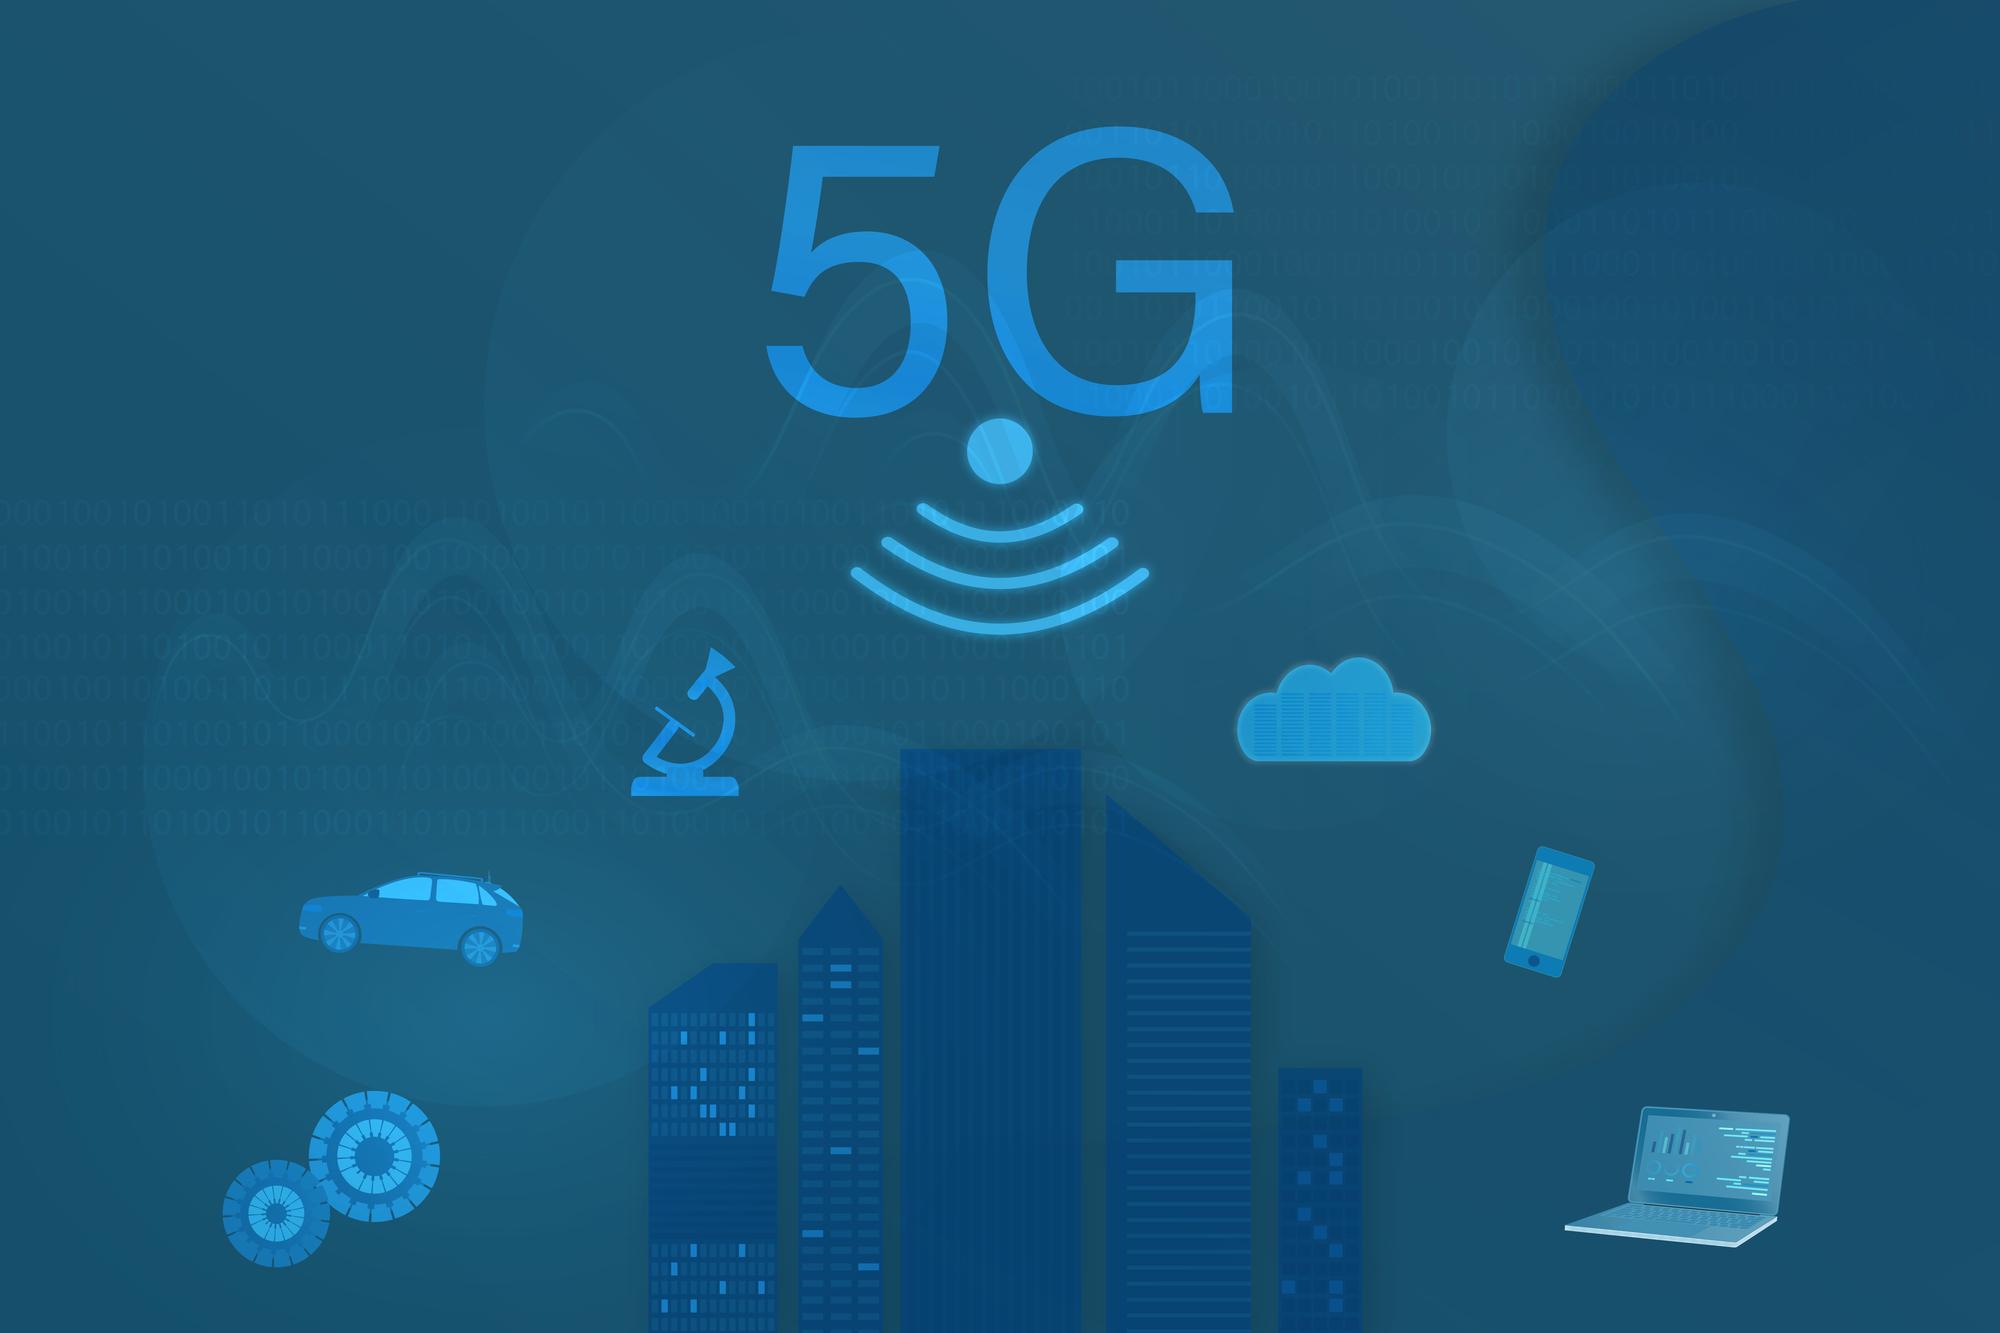 05_5Gの弱点を救うのは、スモールセル(小型基地局)ってホント?5Gの強みと弱みをわかりやすく伝えます